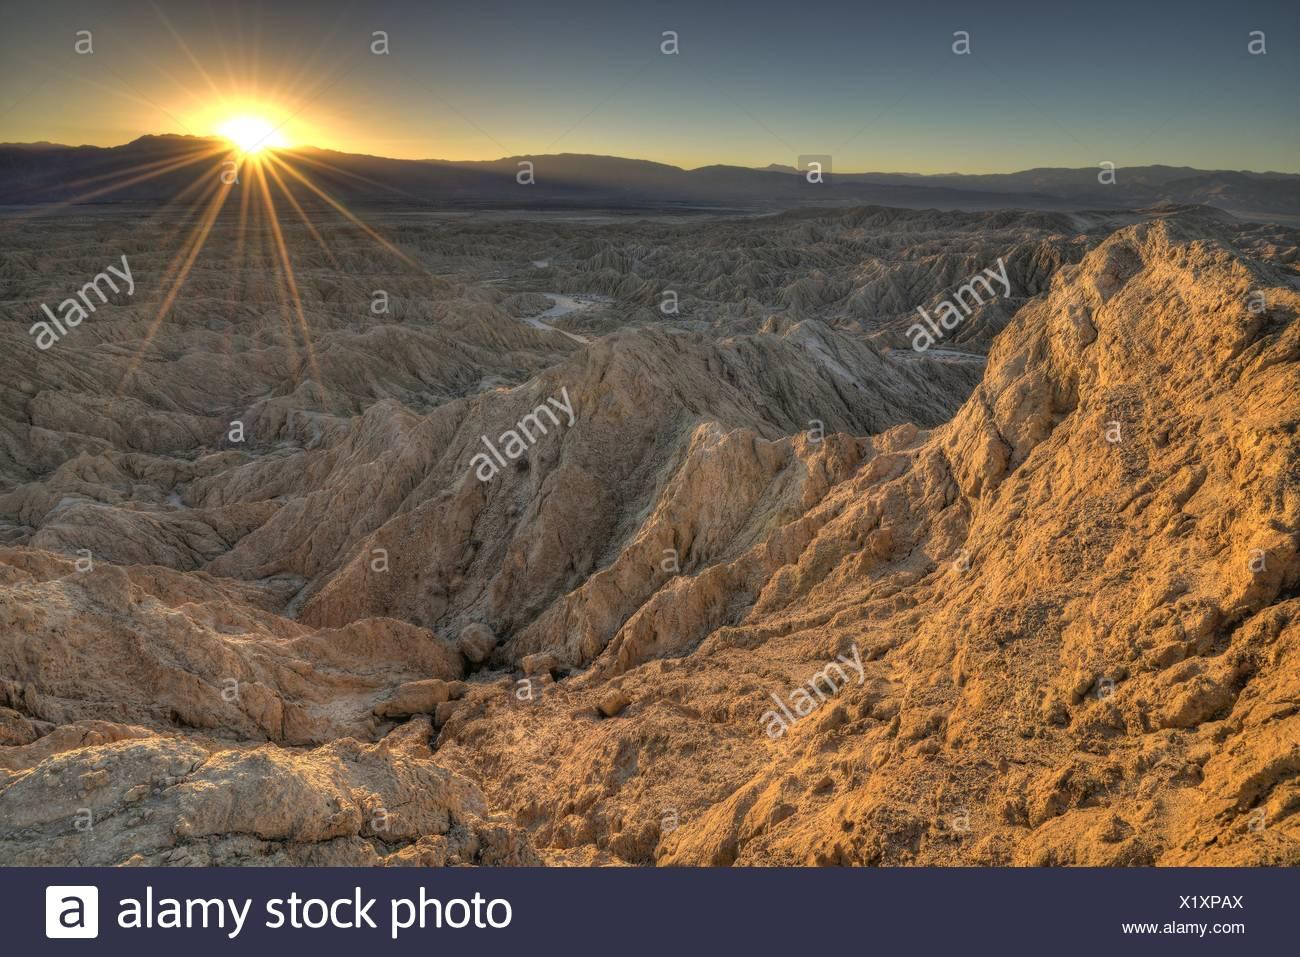 USA, California, Anza-Borrego Desert State Park, Landscape at sunset - Stock Image